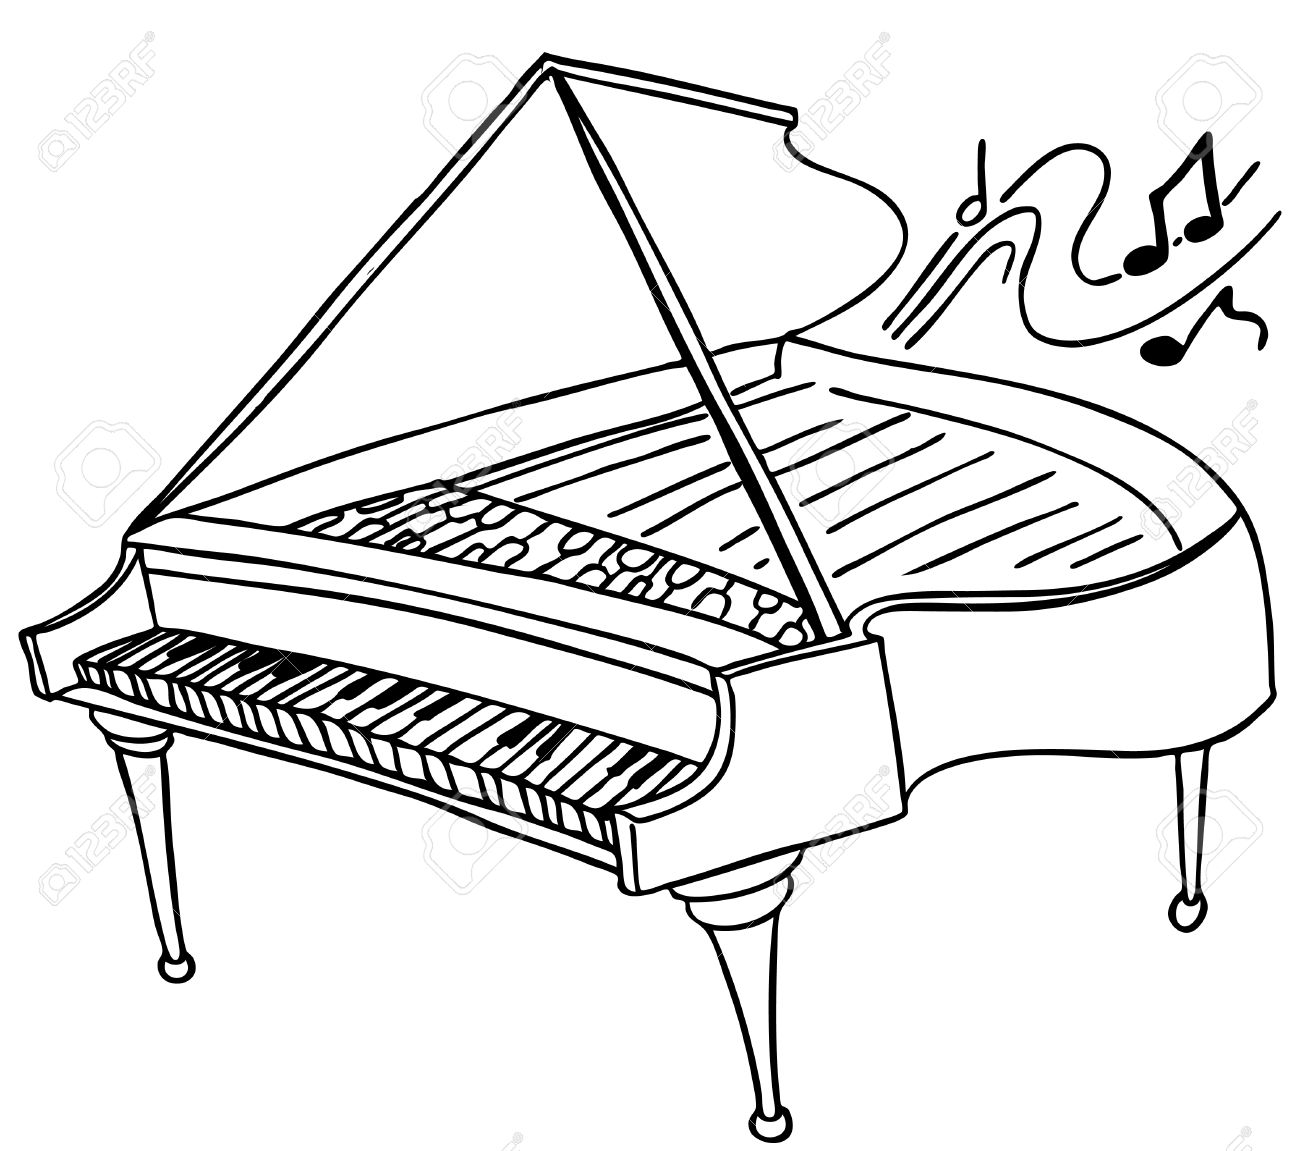 1300x1151 Piano Royalty Free Cliparts, Vectors, And Stock Illustration